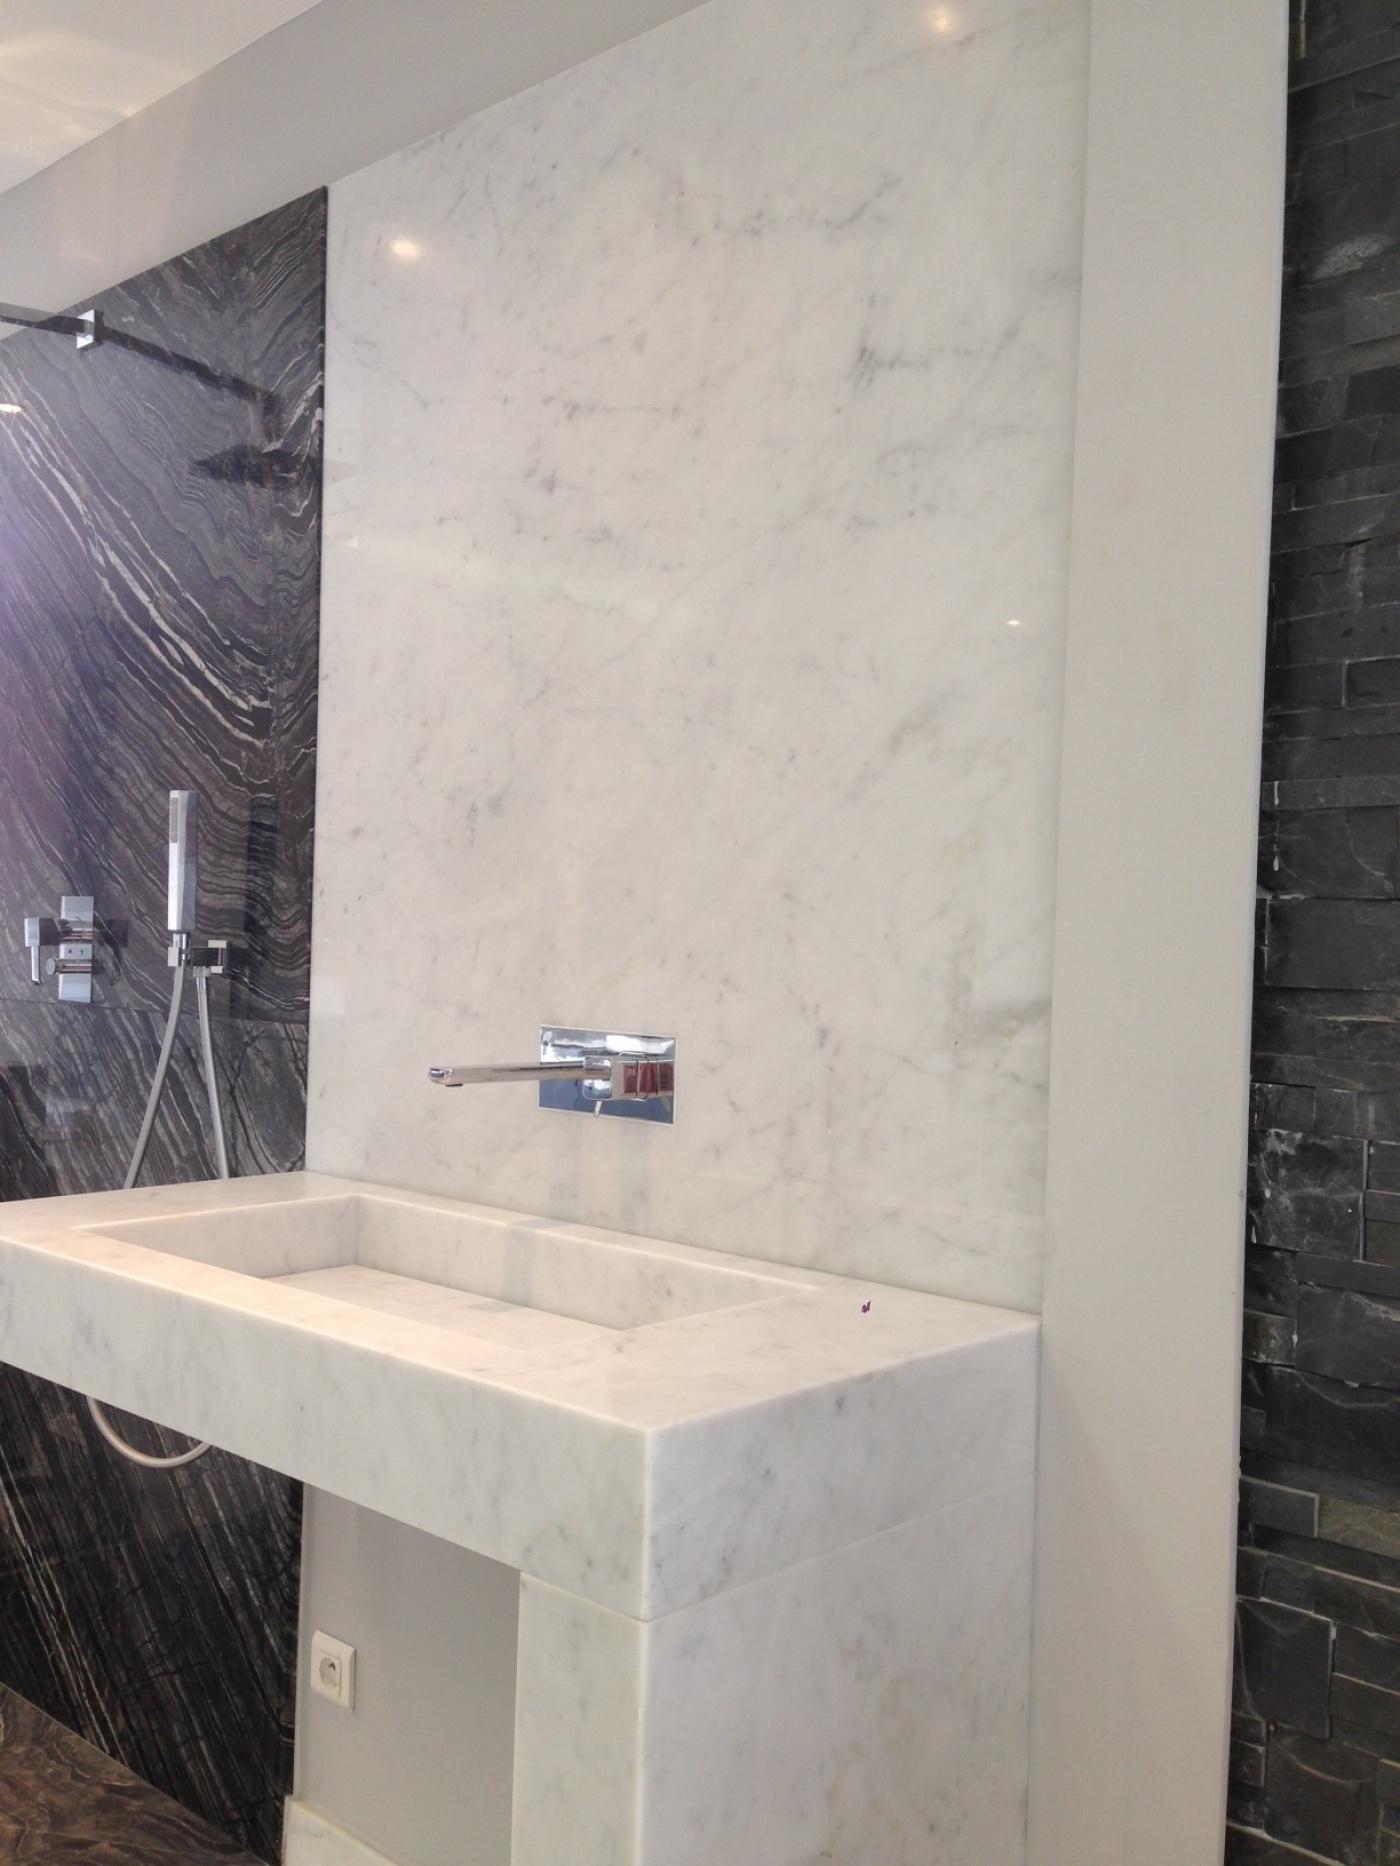 Granit Bianco Carrara   Salle de bains en marbre Blanc de Carrare